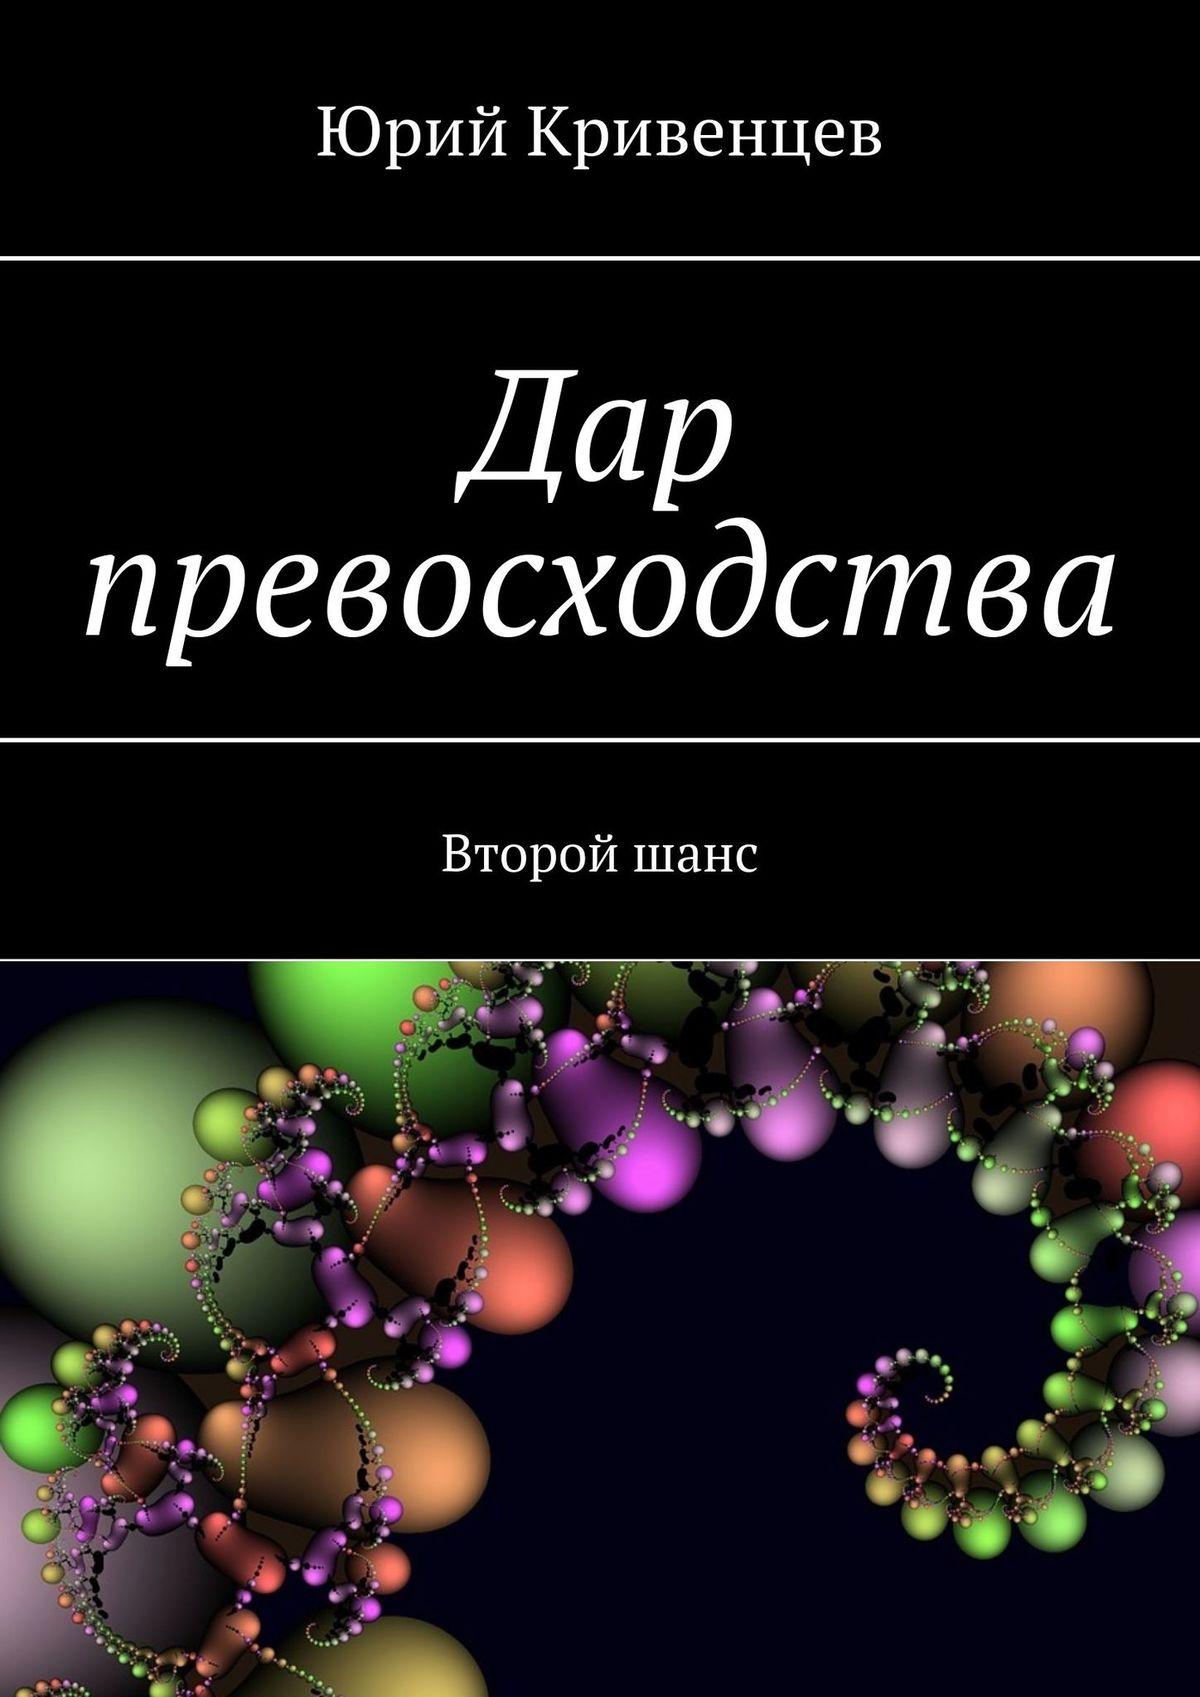 Купить книгу Дар превосходства. Второйшанс, автора Юрия Кривенцева